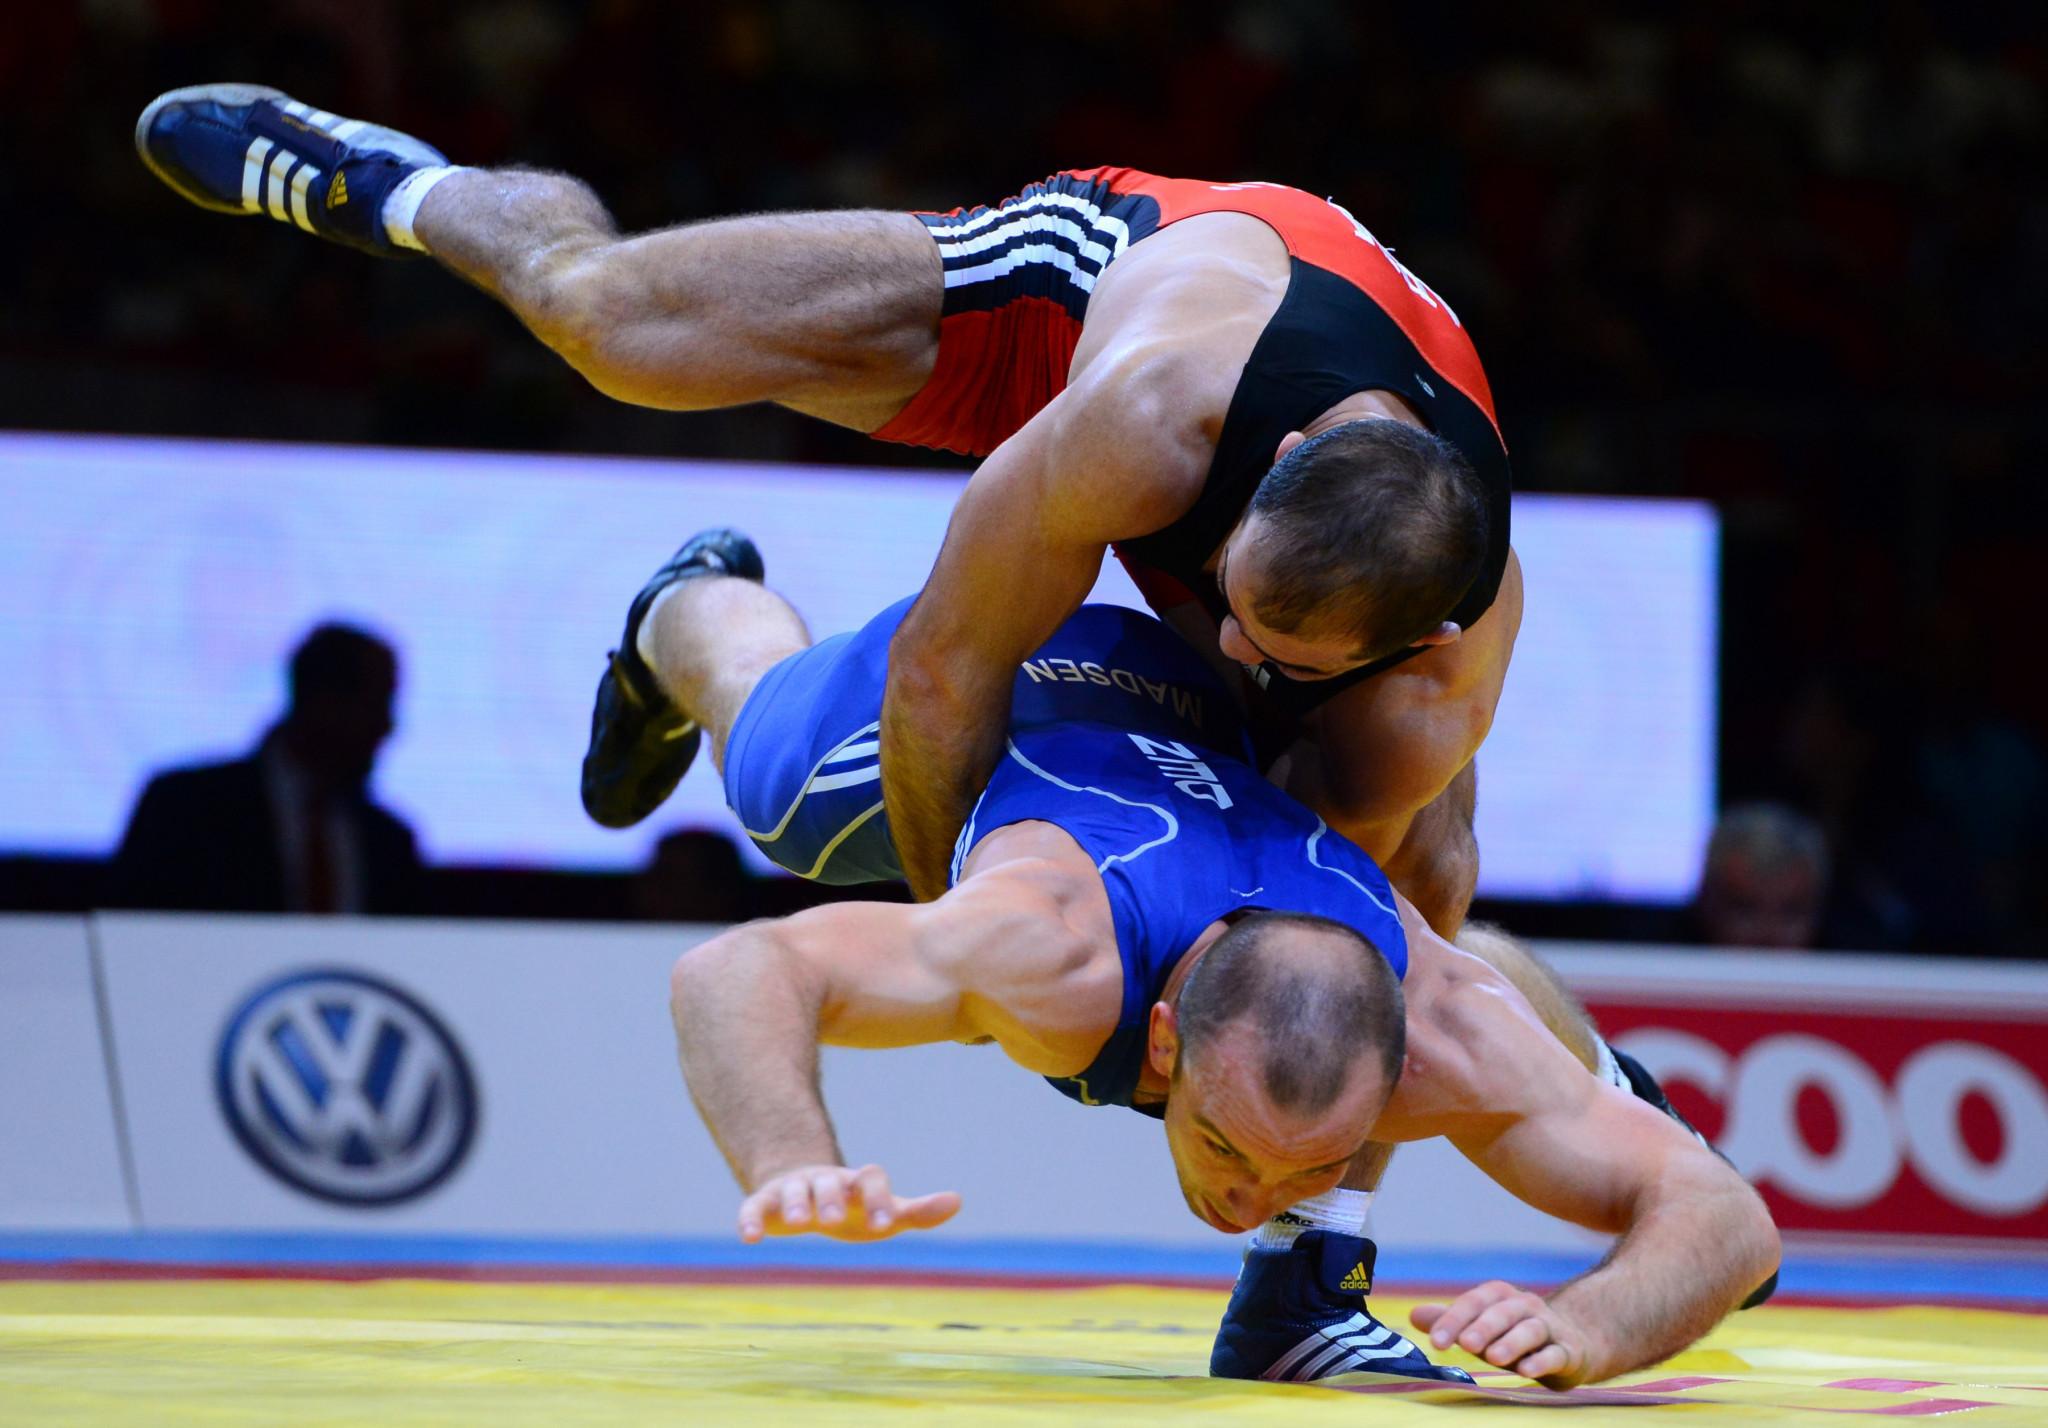 Armenia end Grand Prix de France Henri Deglane with four gold medals in Greco-Roman events